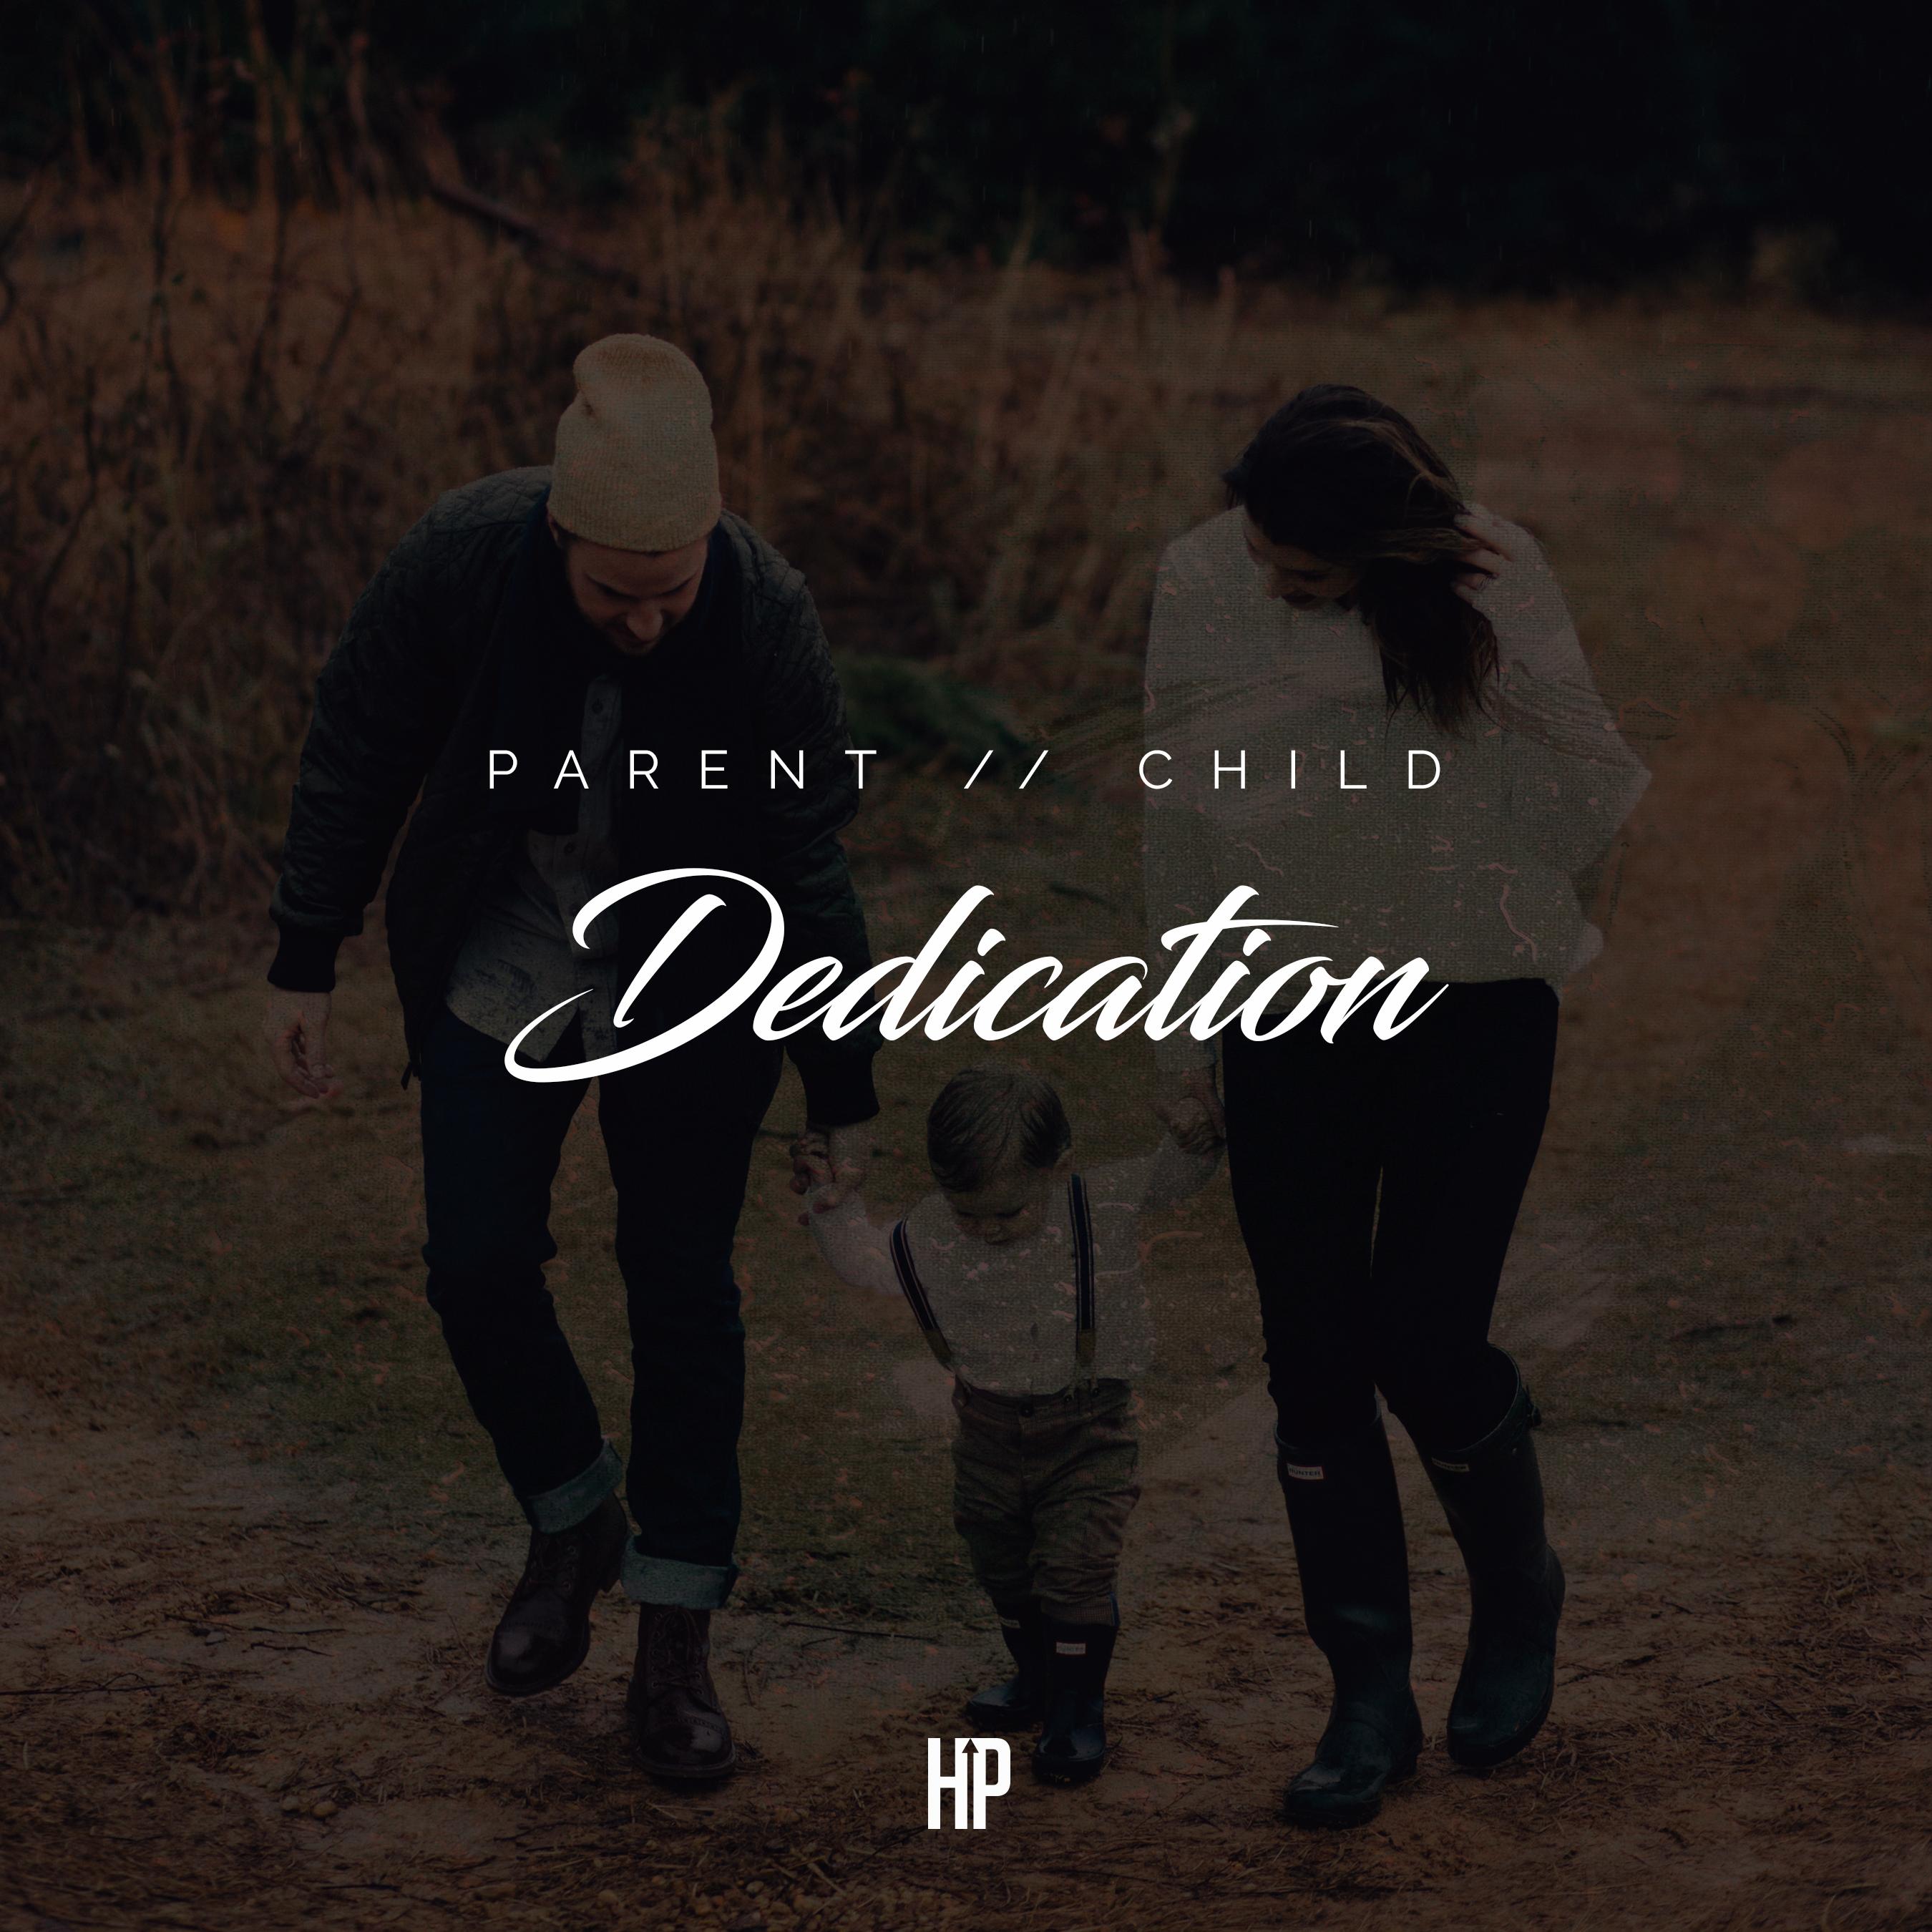 Parentchilddedication